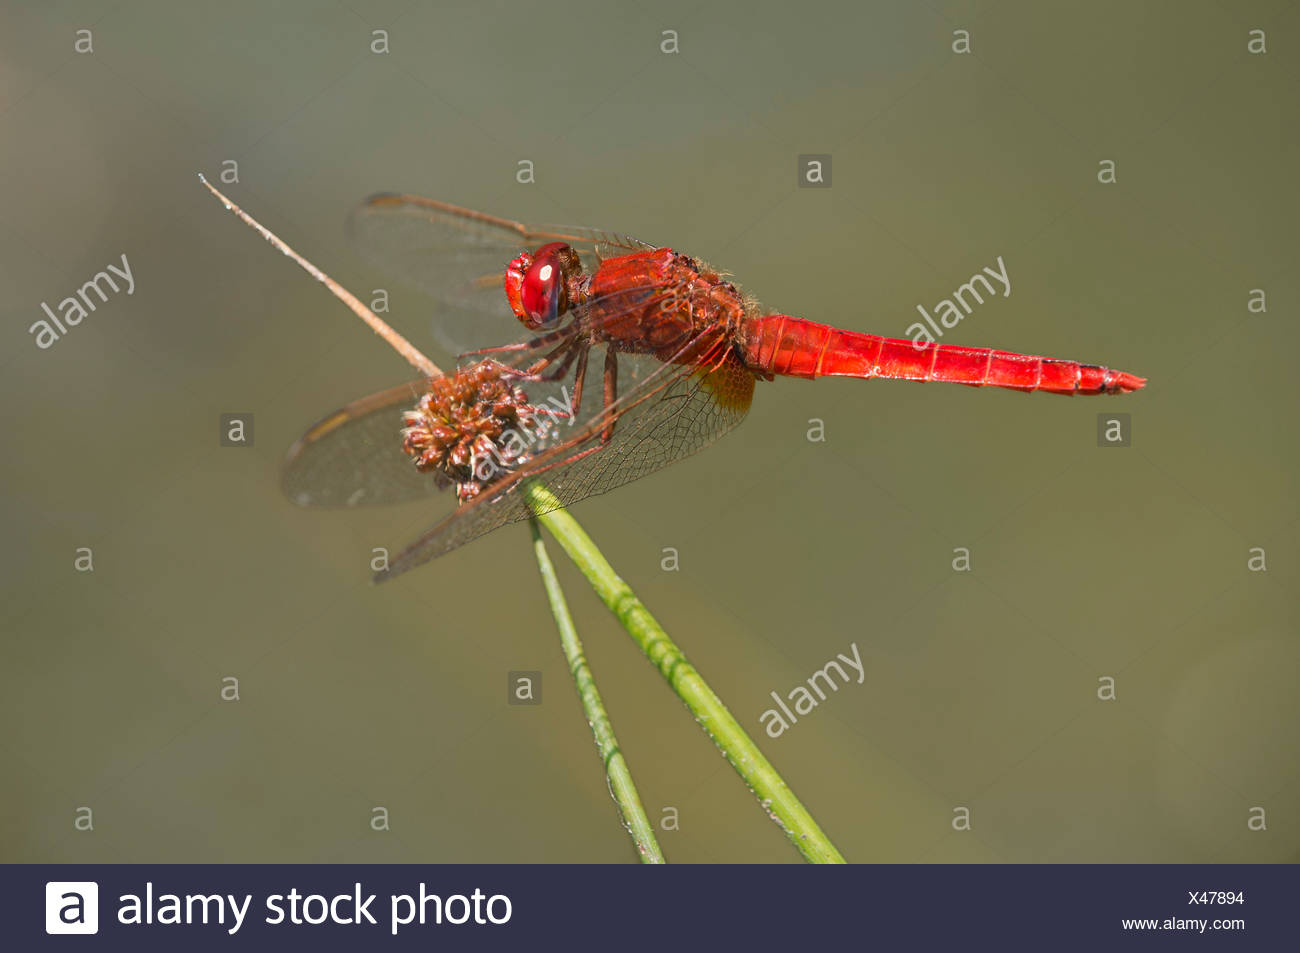 Scarlet Dragonfly (Crocothemis erythraea), male Stock Photo